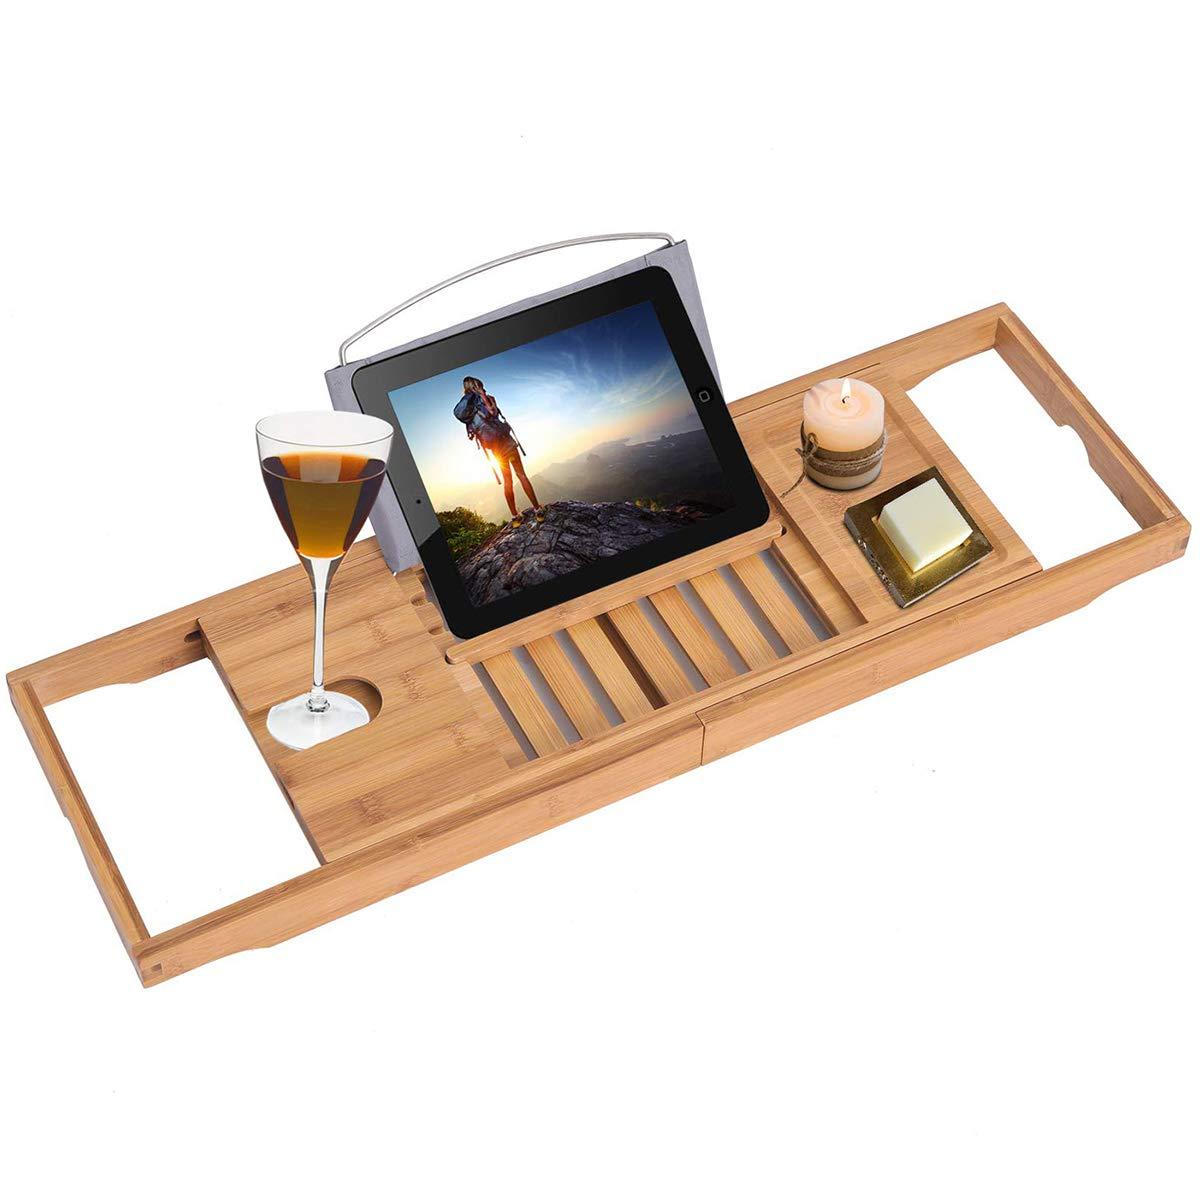 BonusAll Luxury Bathtub Caddy Tray Bamboo Adjustable Organizer Tray One Or Two Person Bath Tray Cellphone Tray and Wine Glass Holder